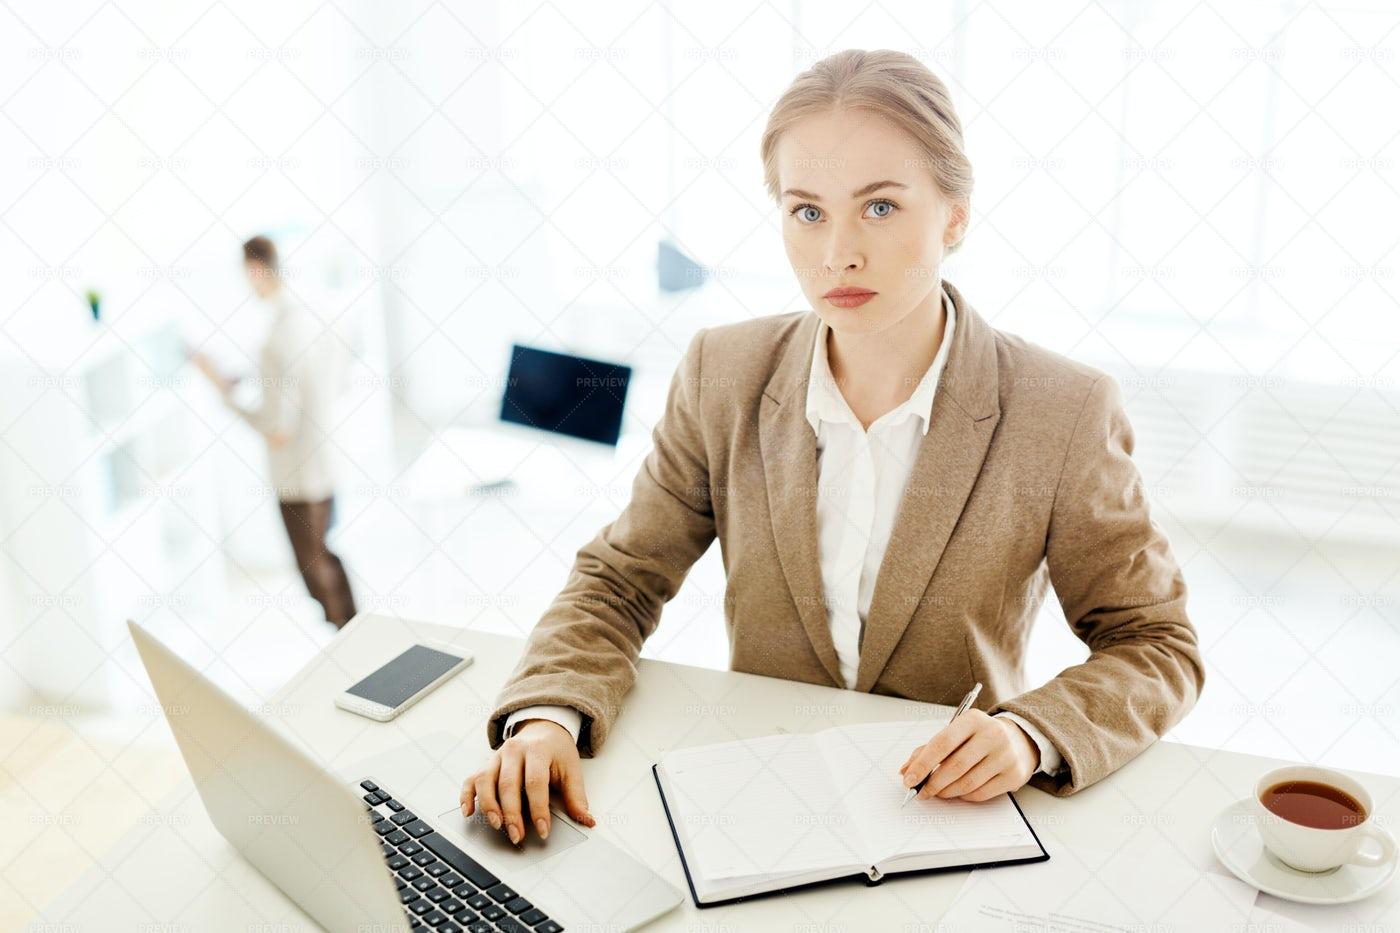 Portrait Of Elegant White Collar Worker: Stock Photos